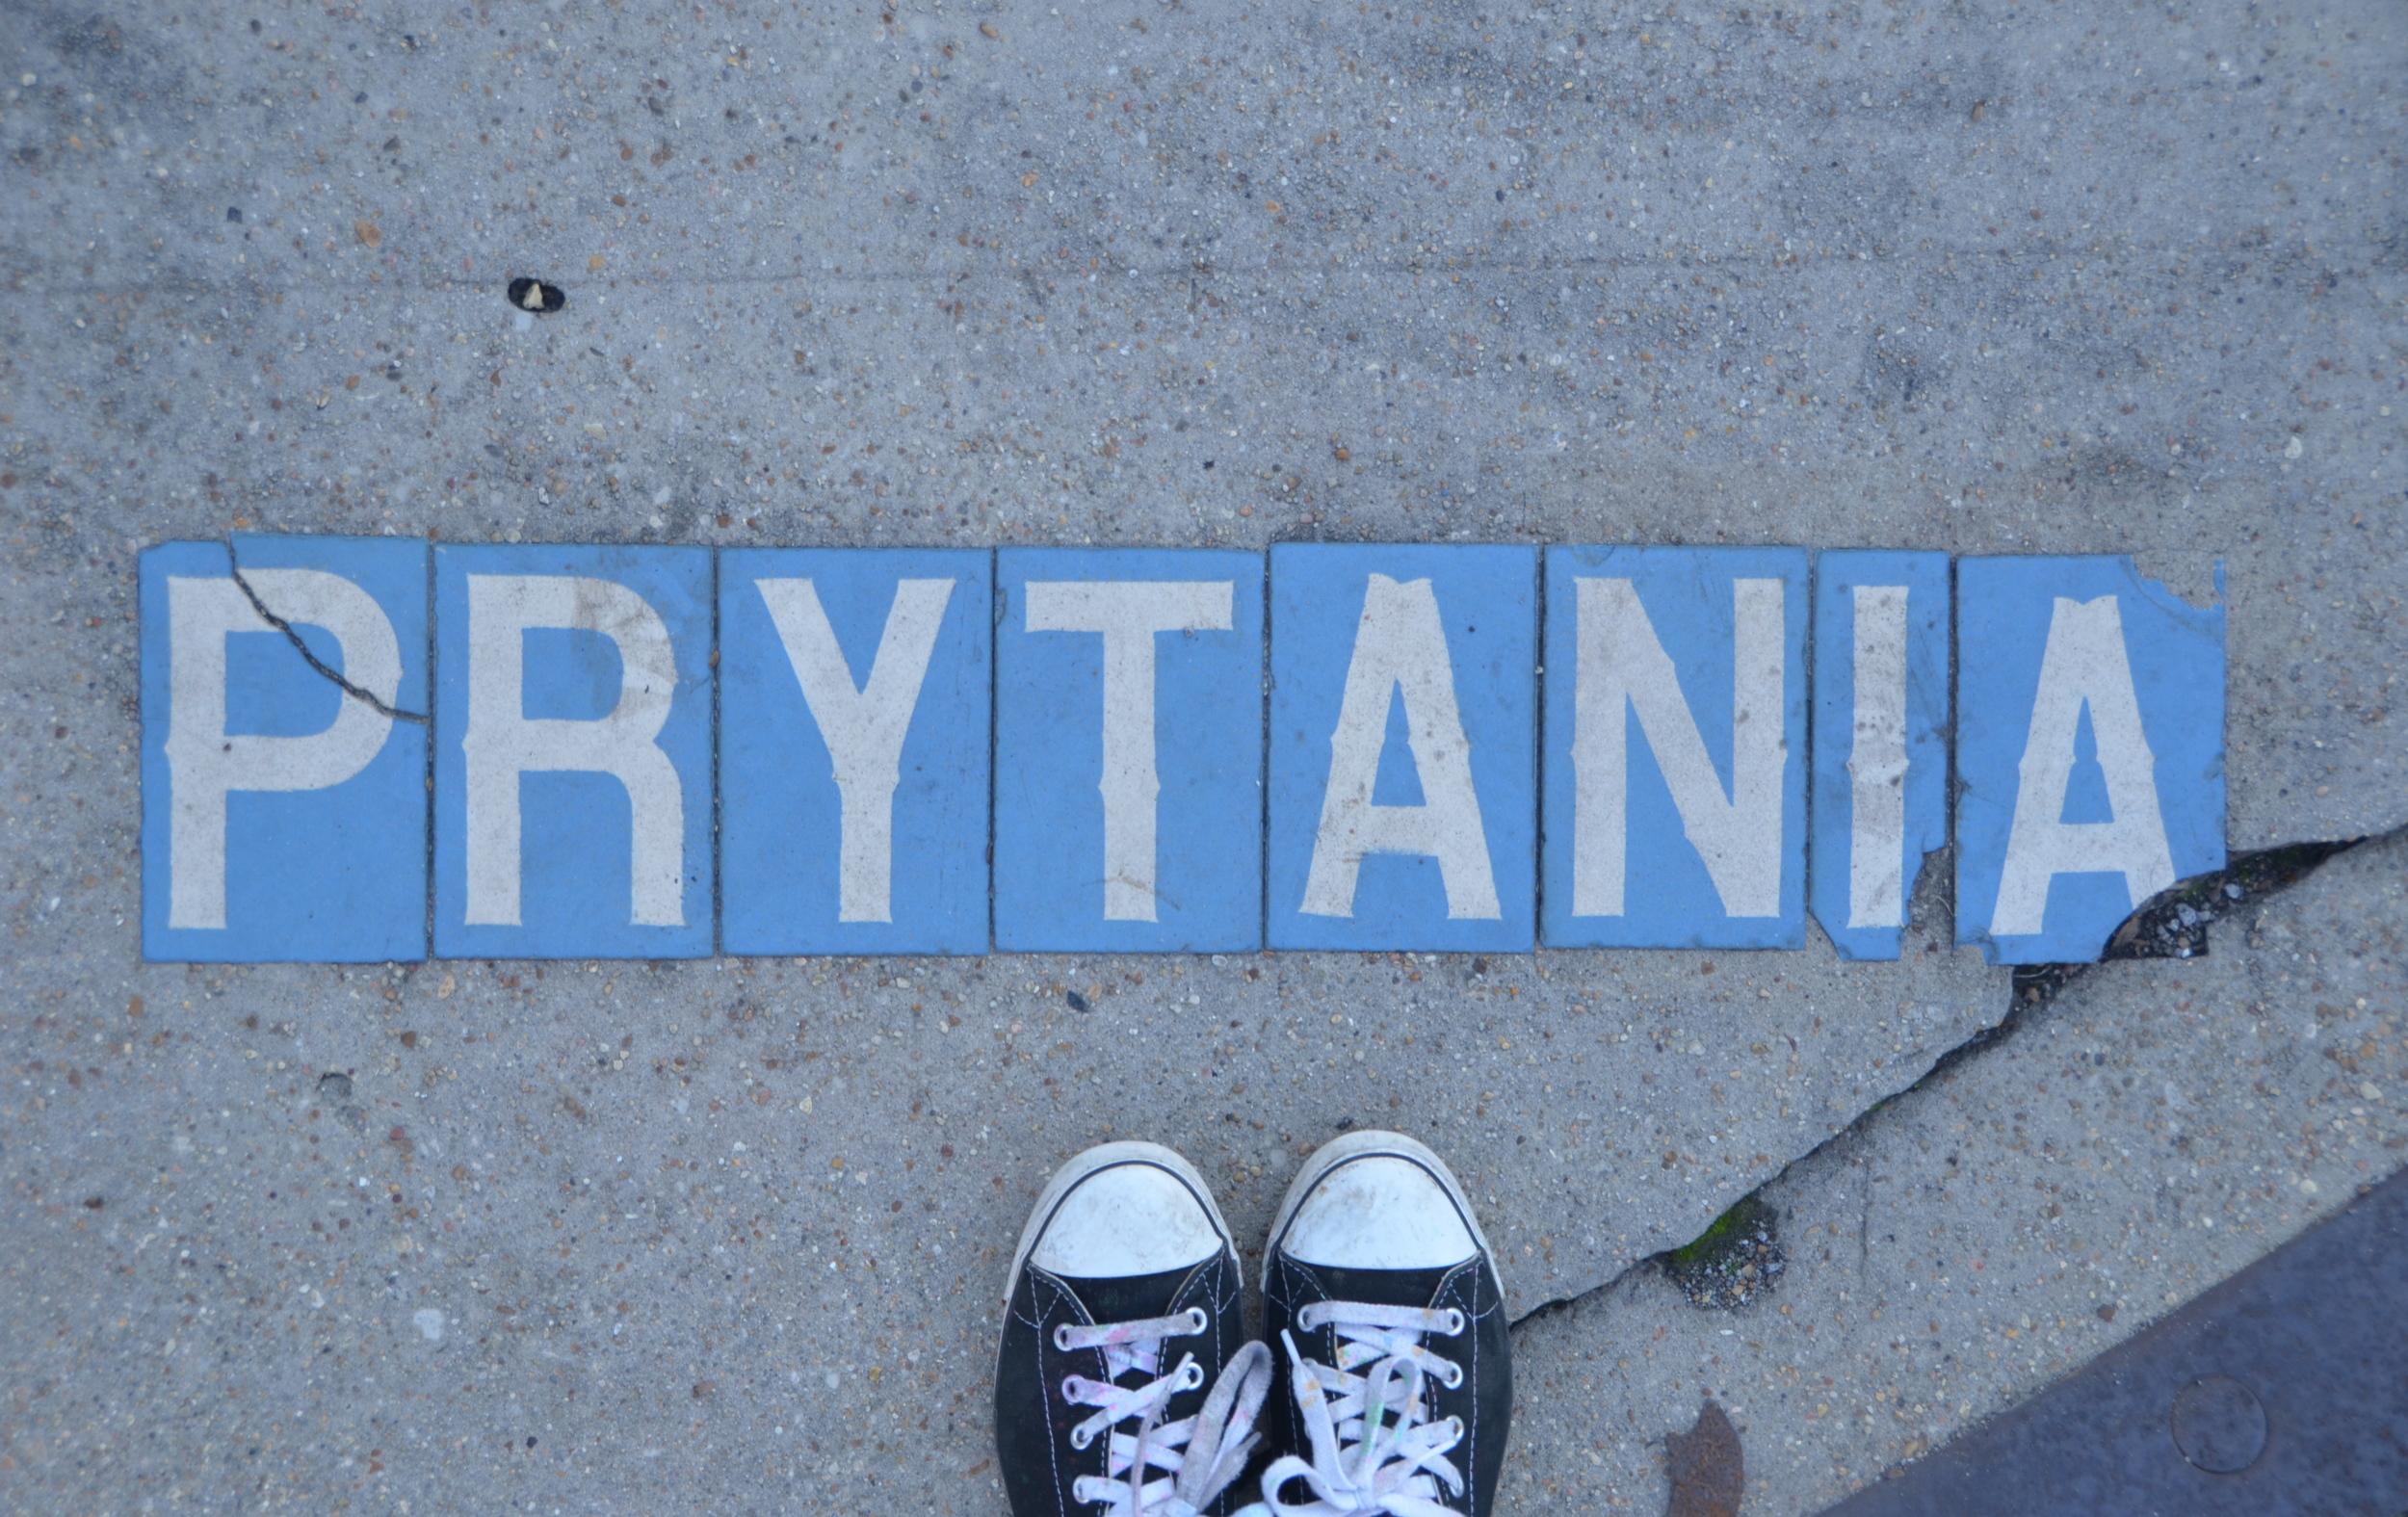 The Corner of Prytania and Joseph.